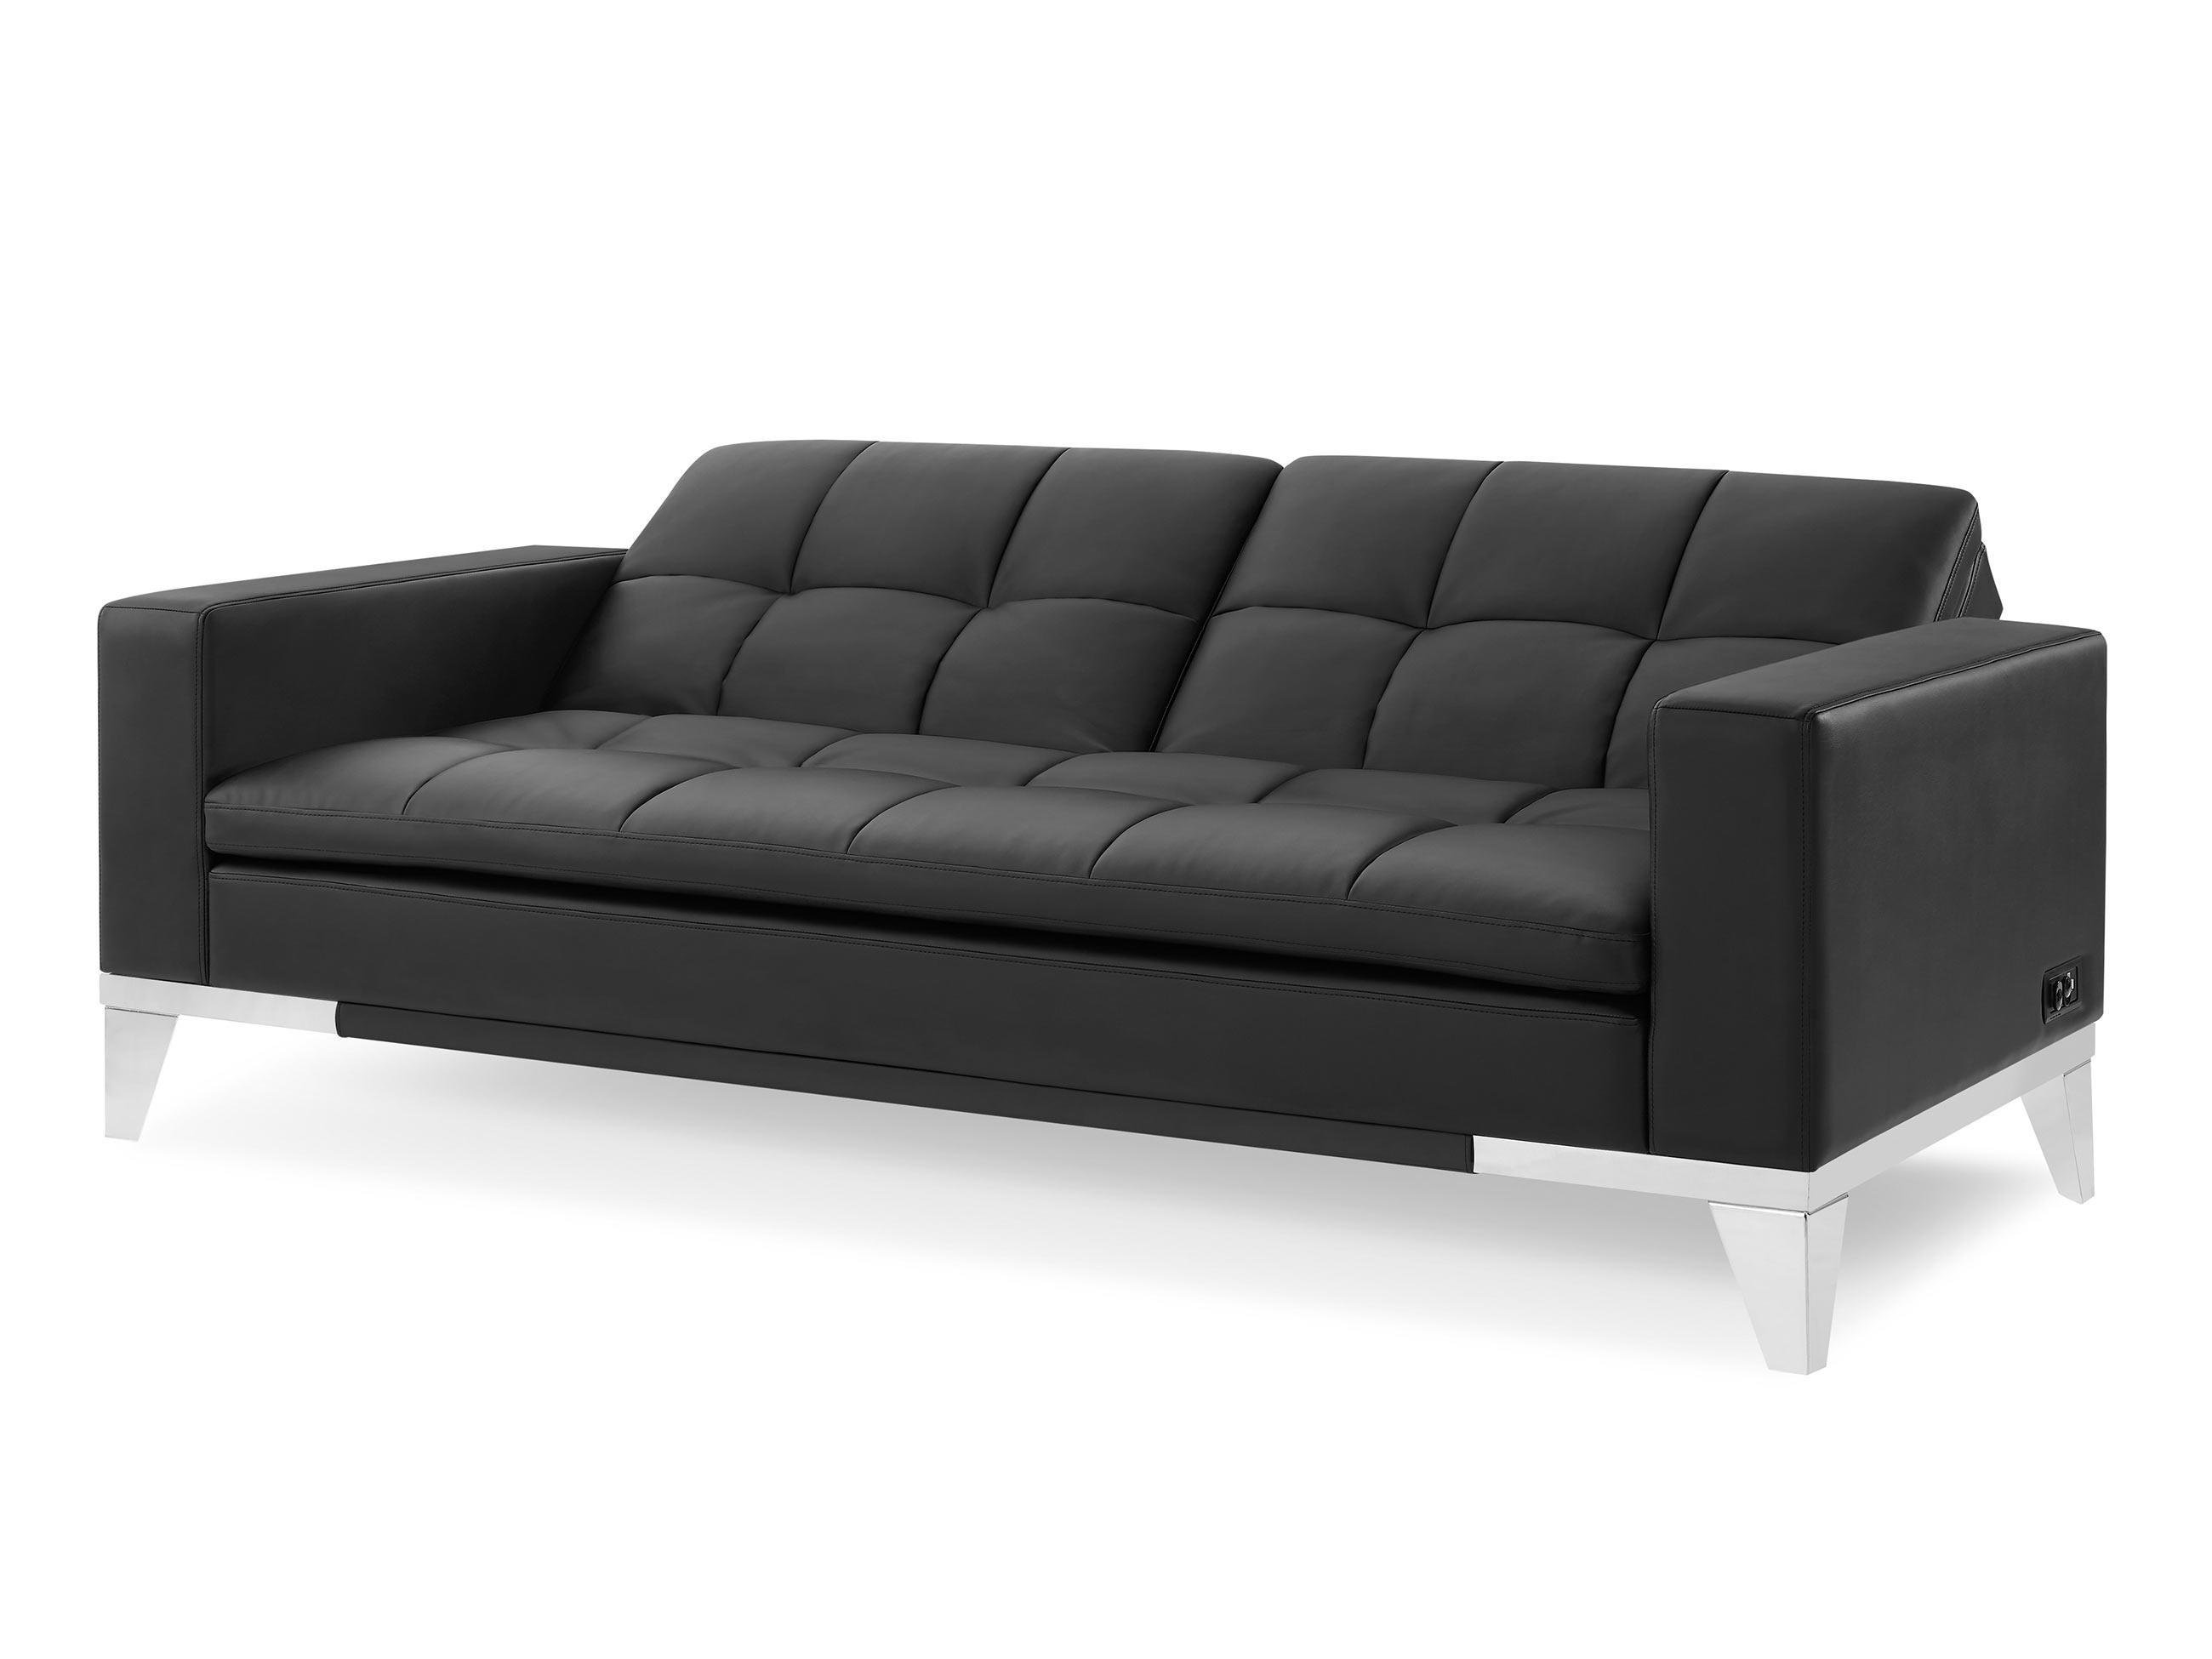 Wondrous Westridge Convertible Sofa Black By Serta Lifestyle Cjindustries Chair Design For Home Cjindustriesco